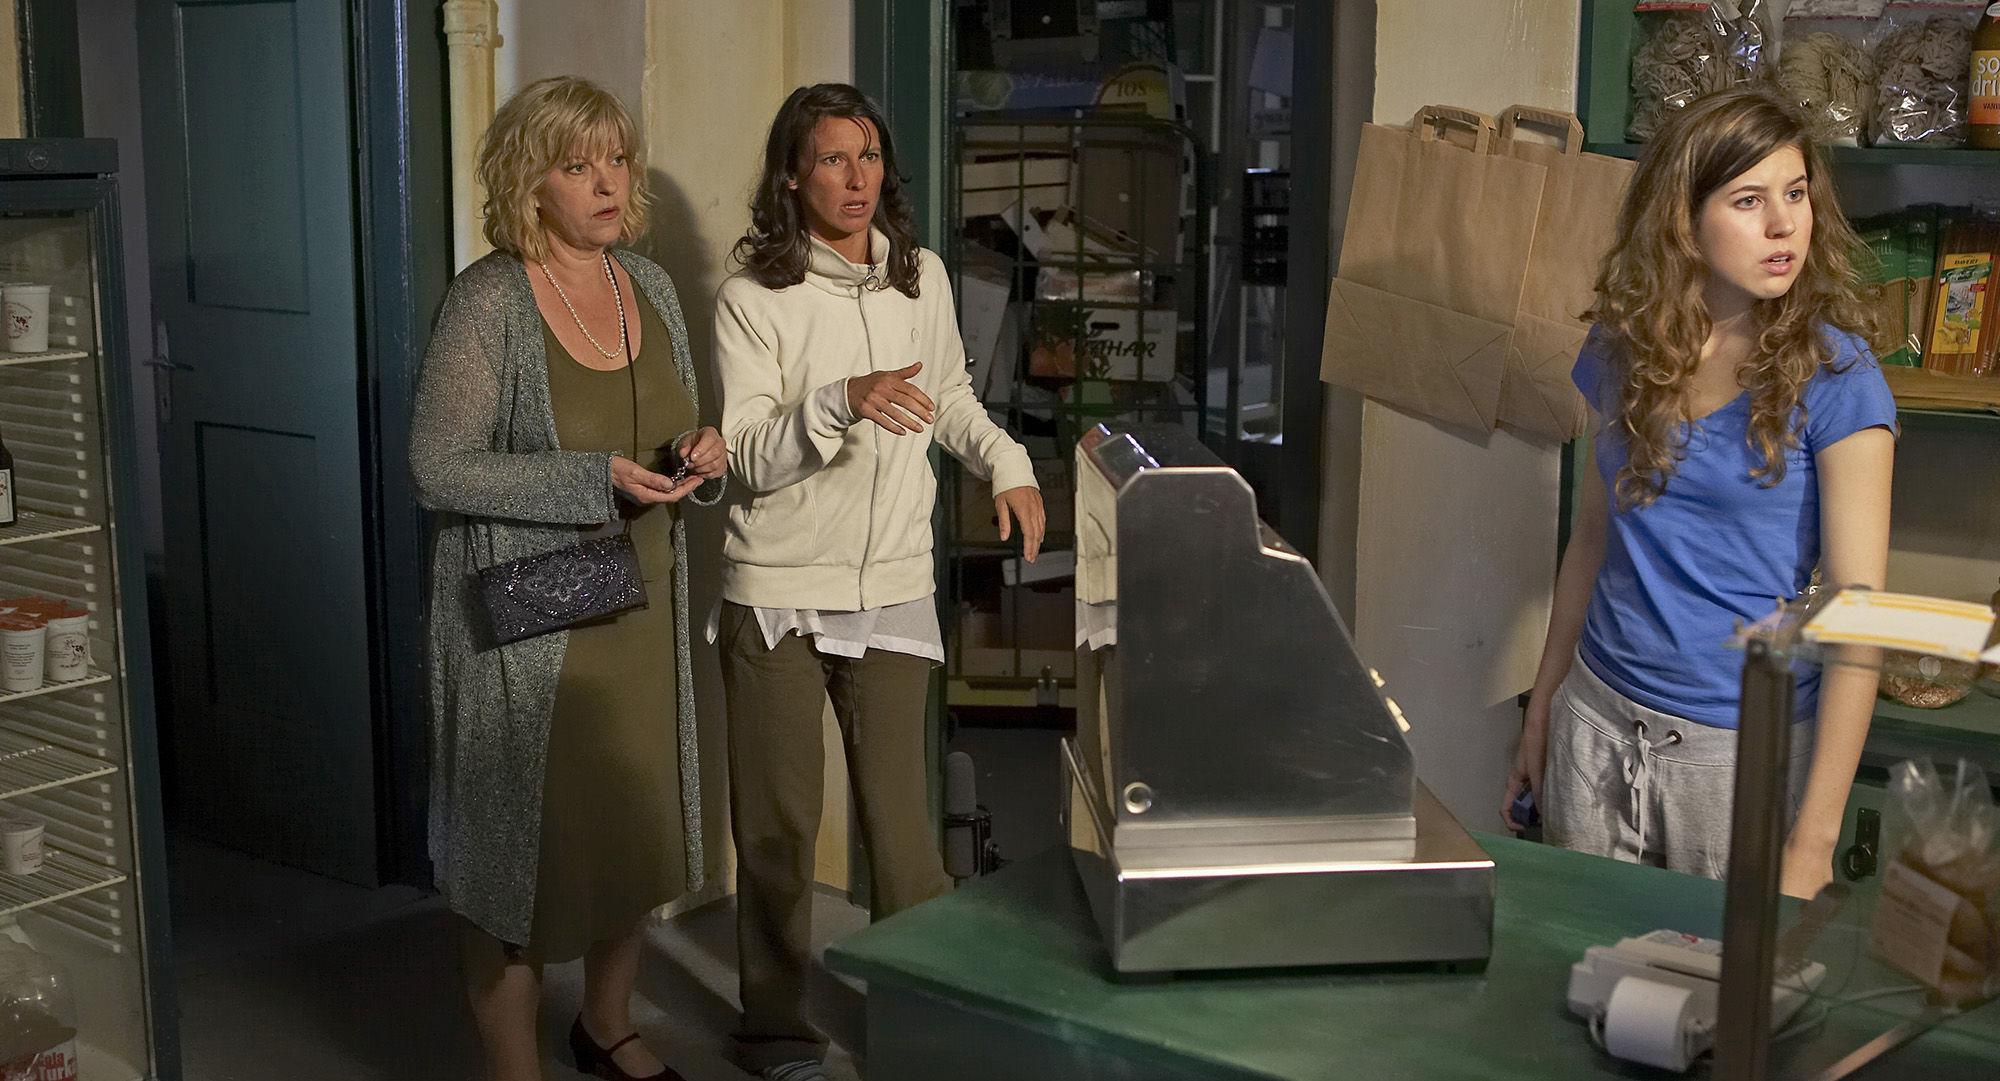 Elfi Eschke (Sarah Horrowitz), Maria Köstlinger (Anna Schnabel), Nora Heschl (Judith Schnabel)